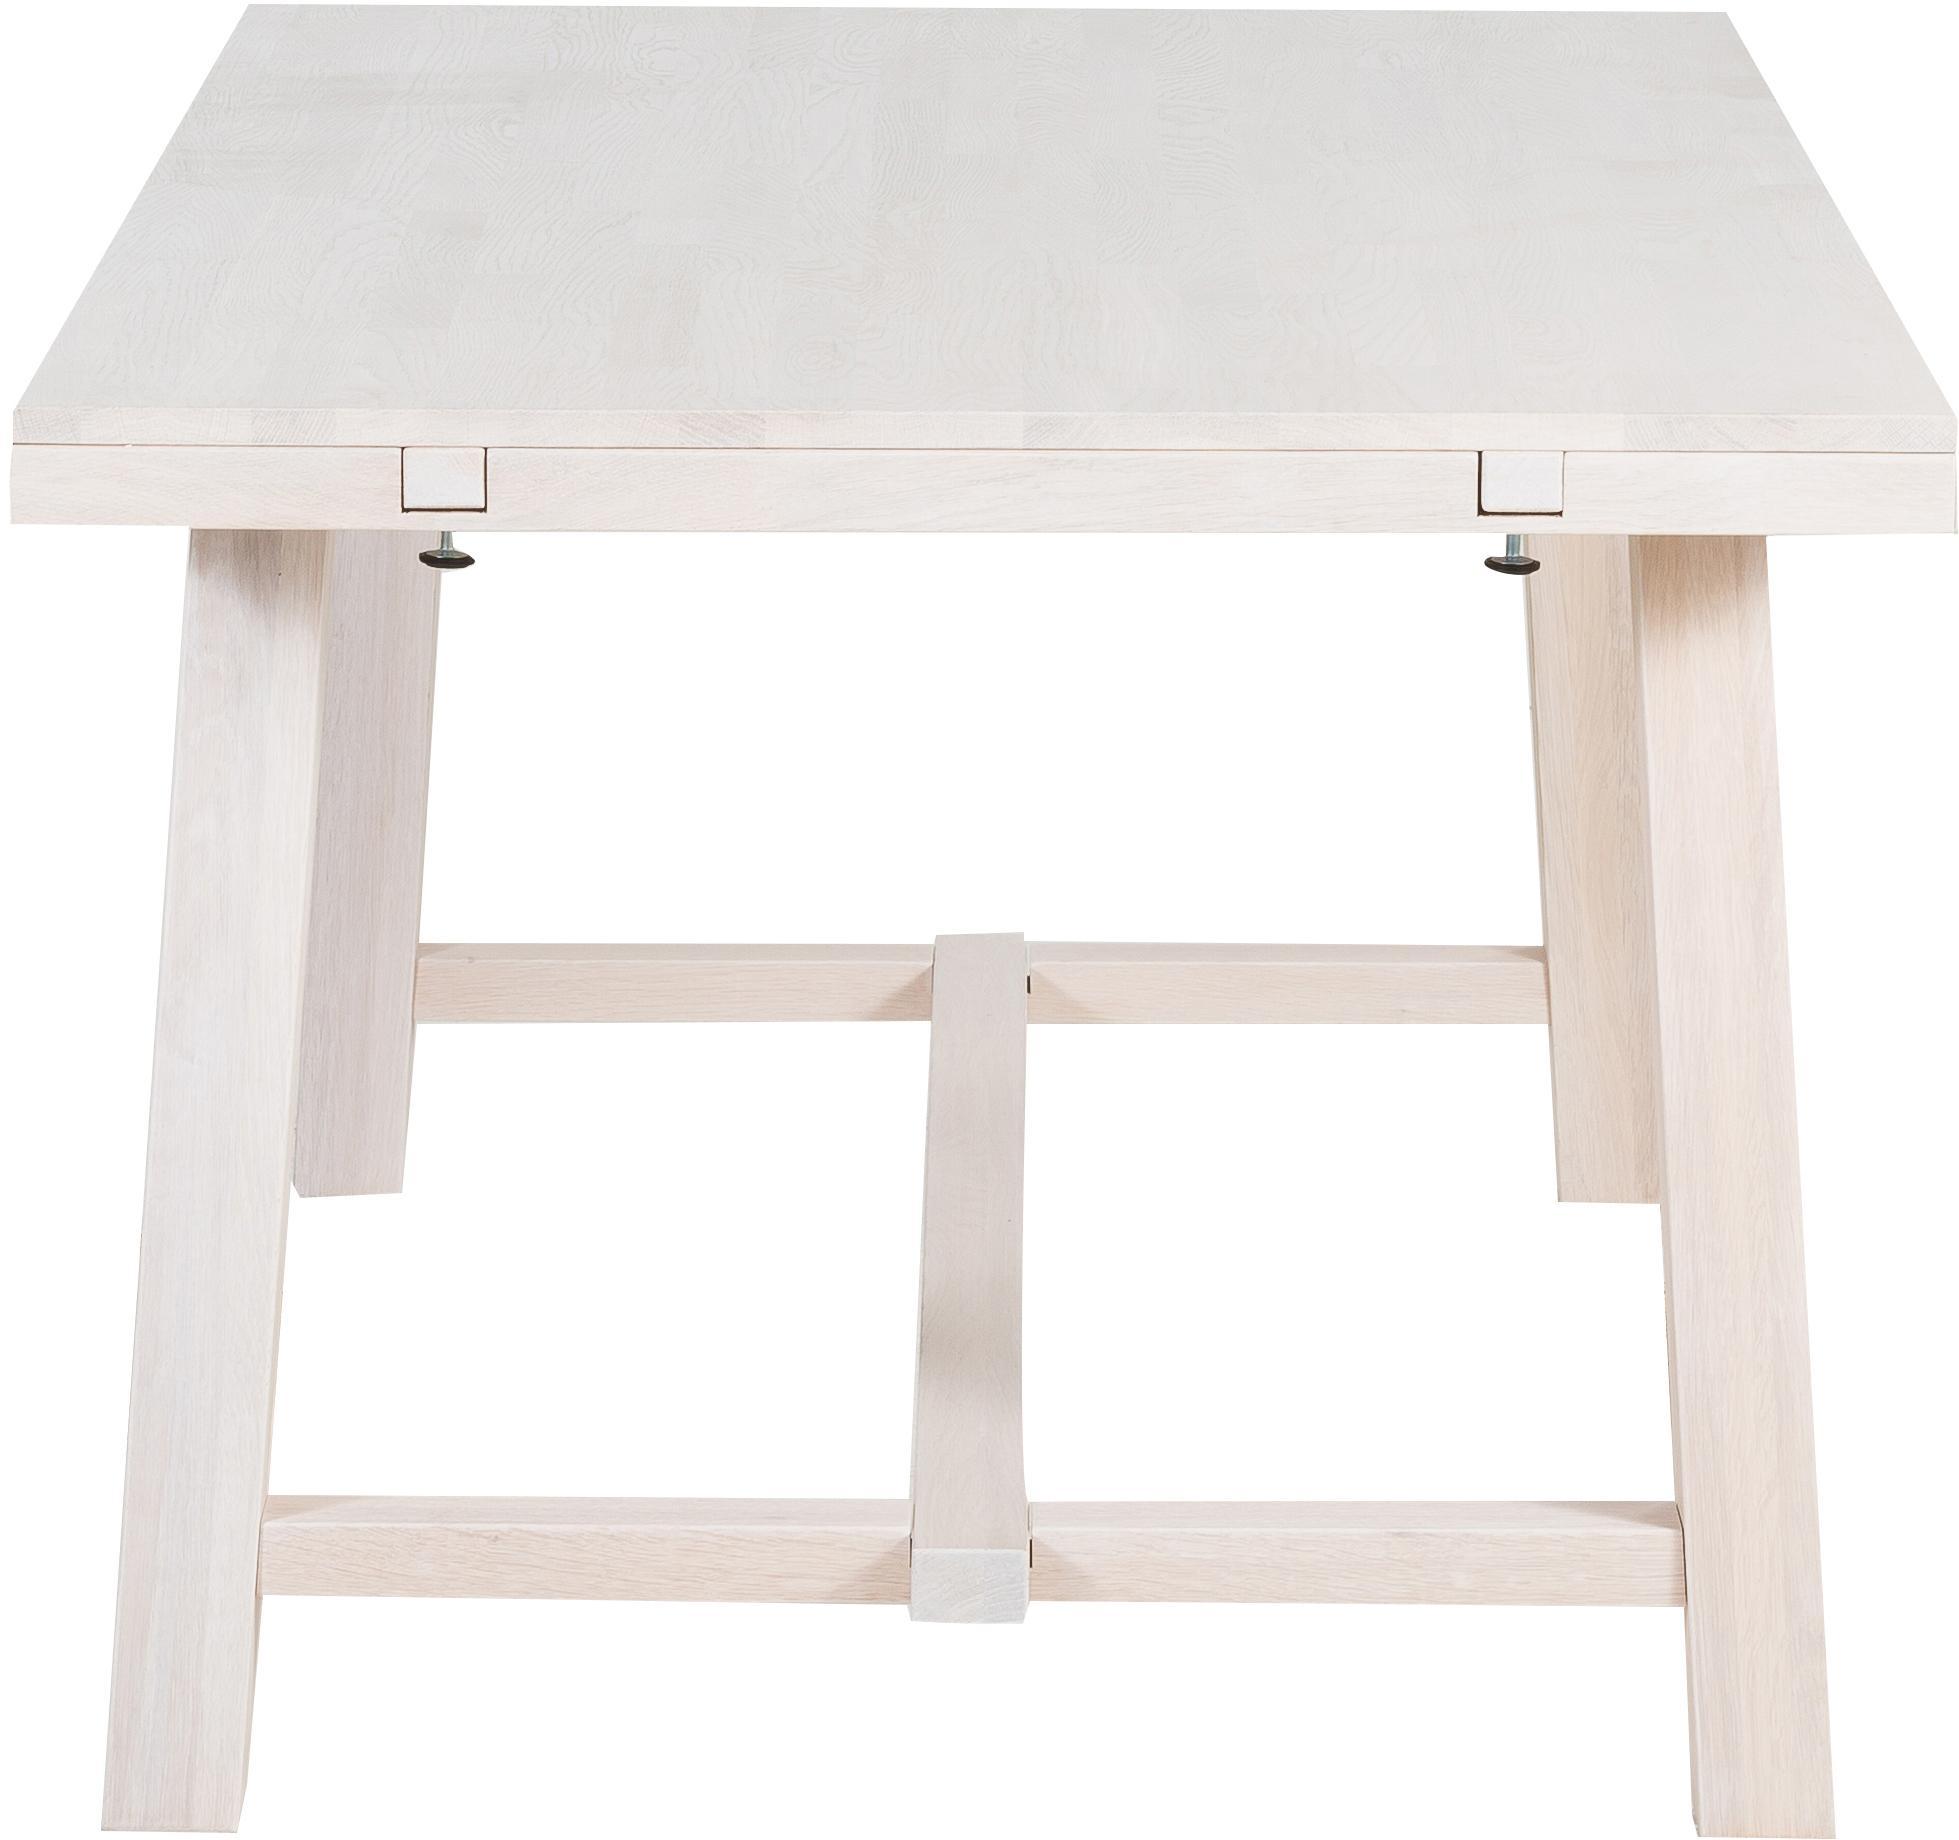 Table extensible en chêne massifBrooklyn, Bois de chêne, blanc délavé